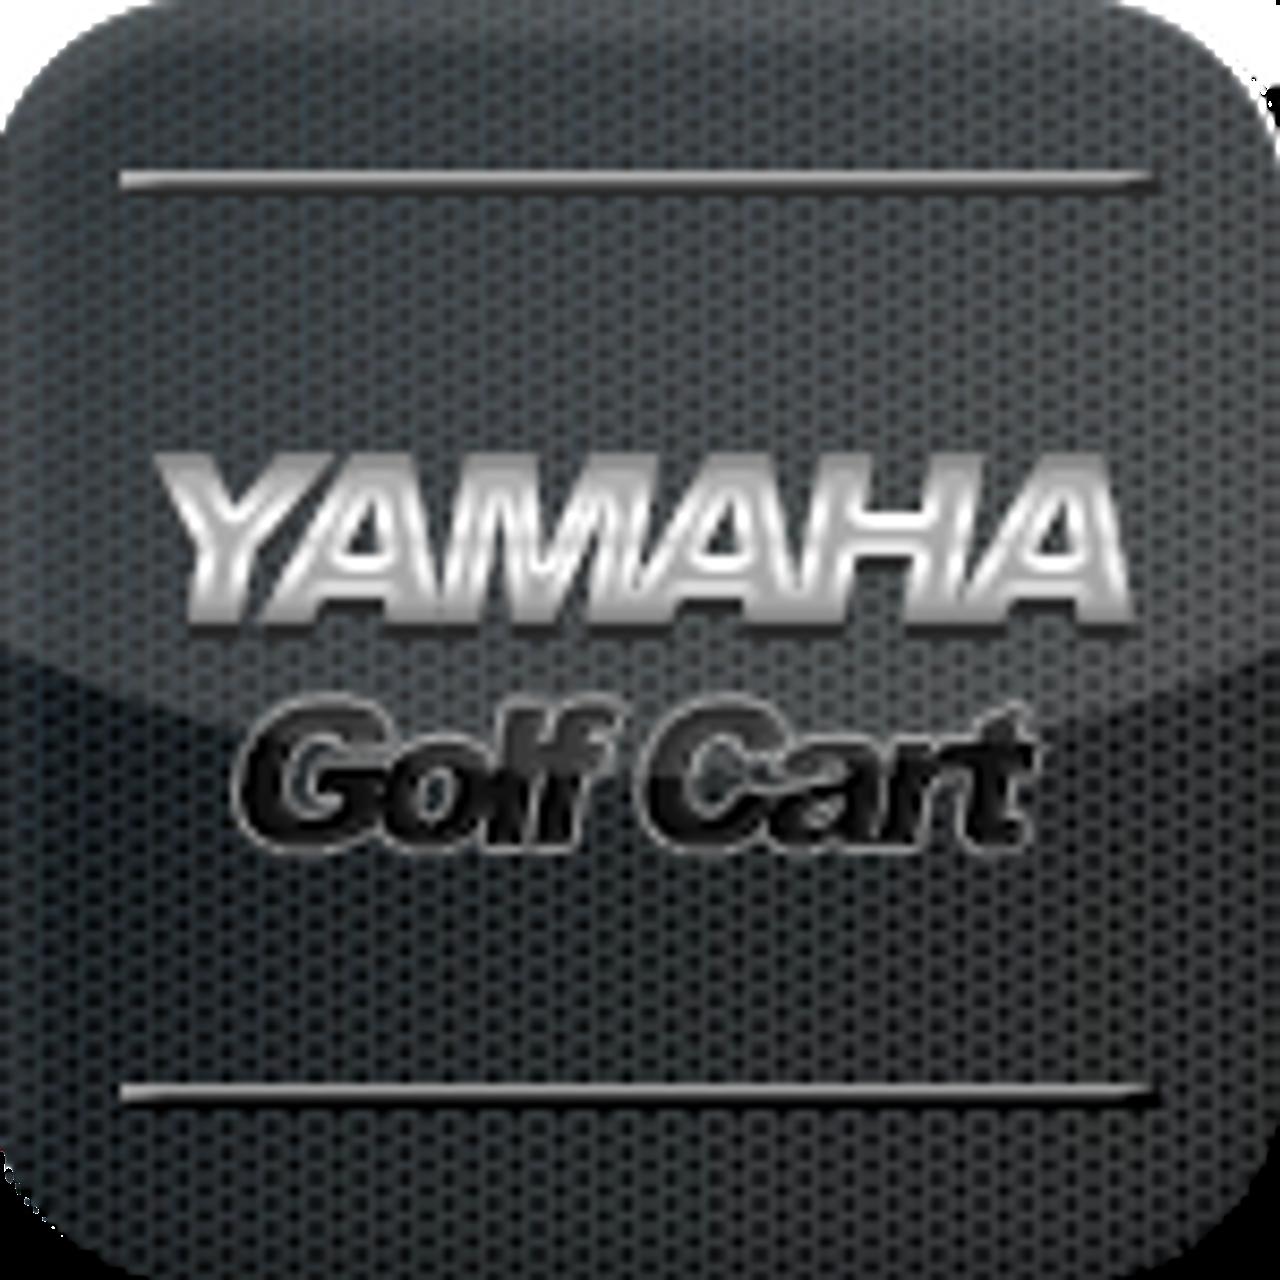 Yamaha Mufflers